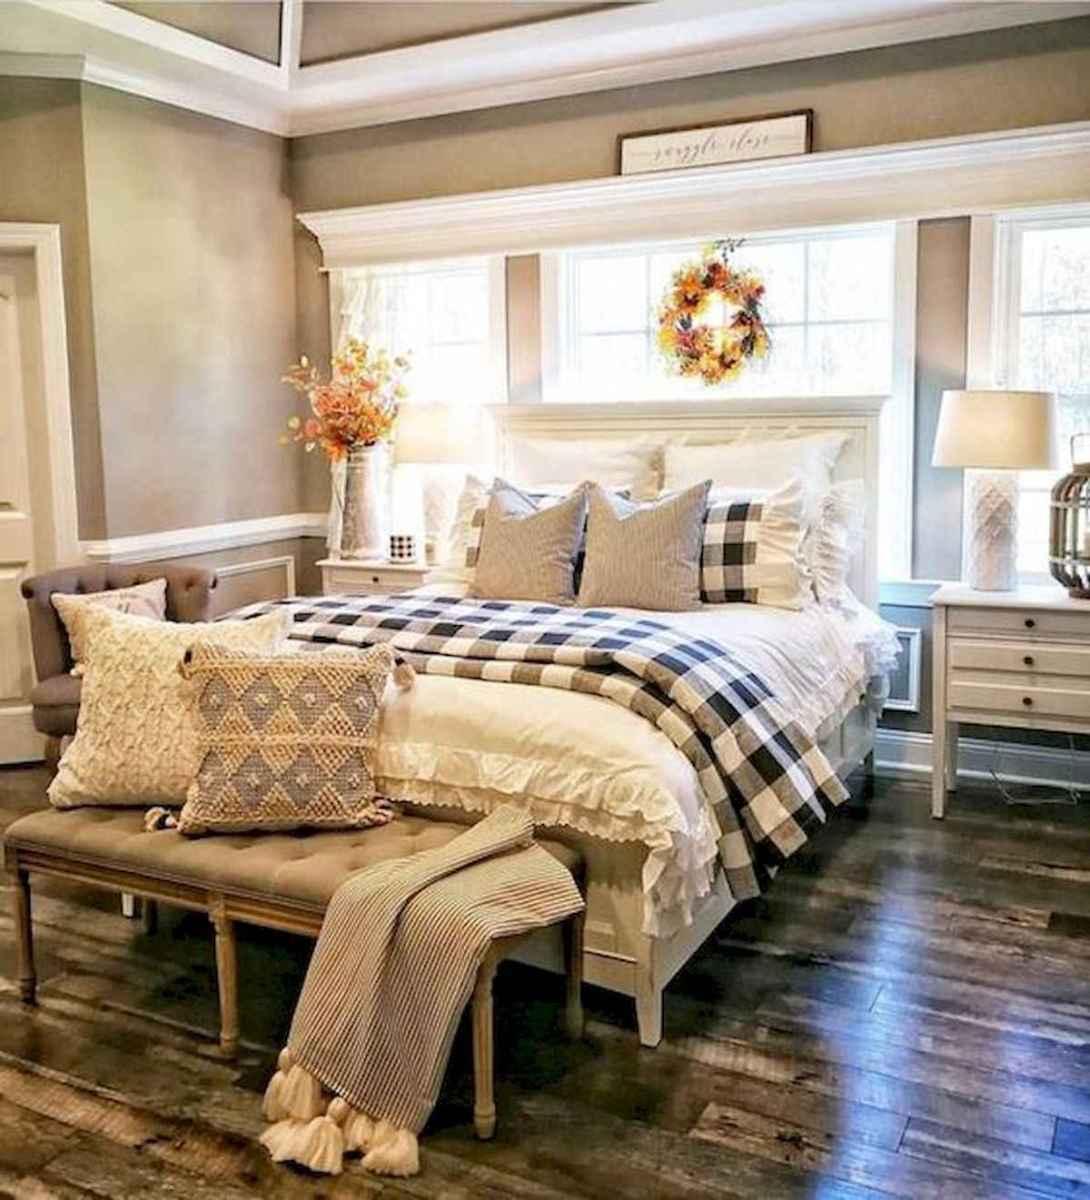 50 Favorite Bedding for Farmhouse Bedroom Design Ideas and Decor (27)